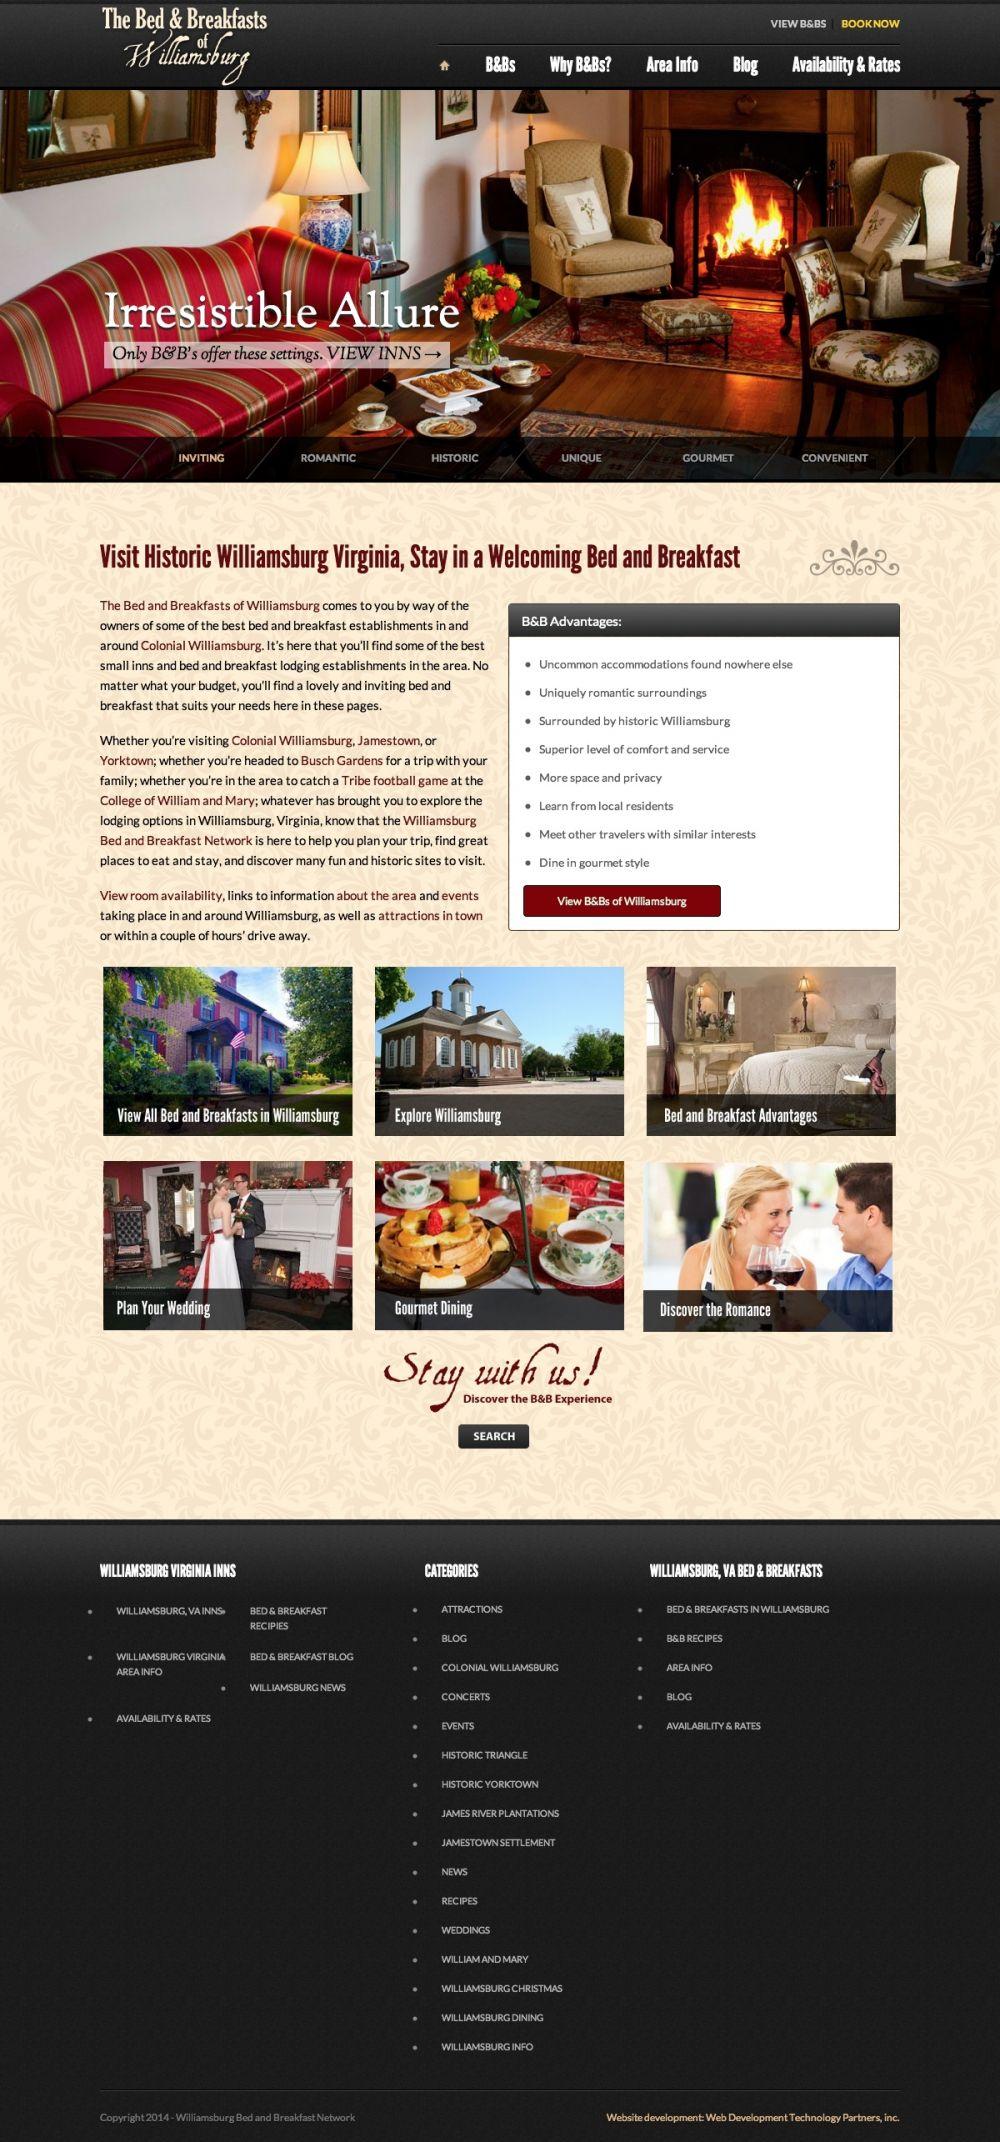 Williamsburg Bed & Breakfast Network